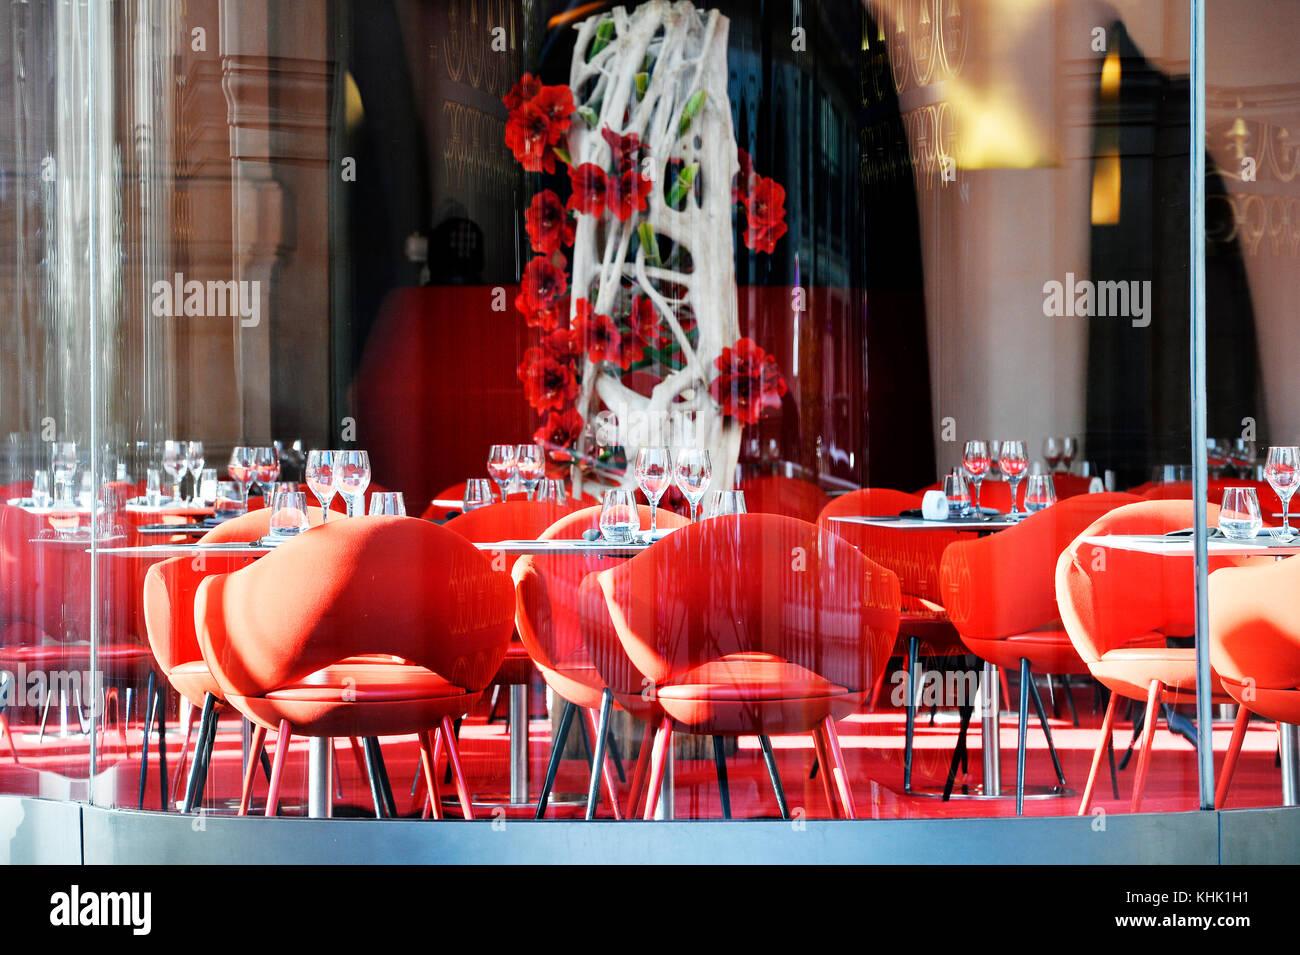 Restaurant Opéra, Palais Garnier, Paris, France - Stock Image